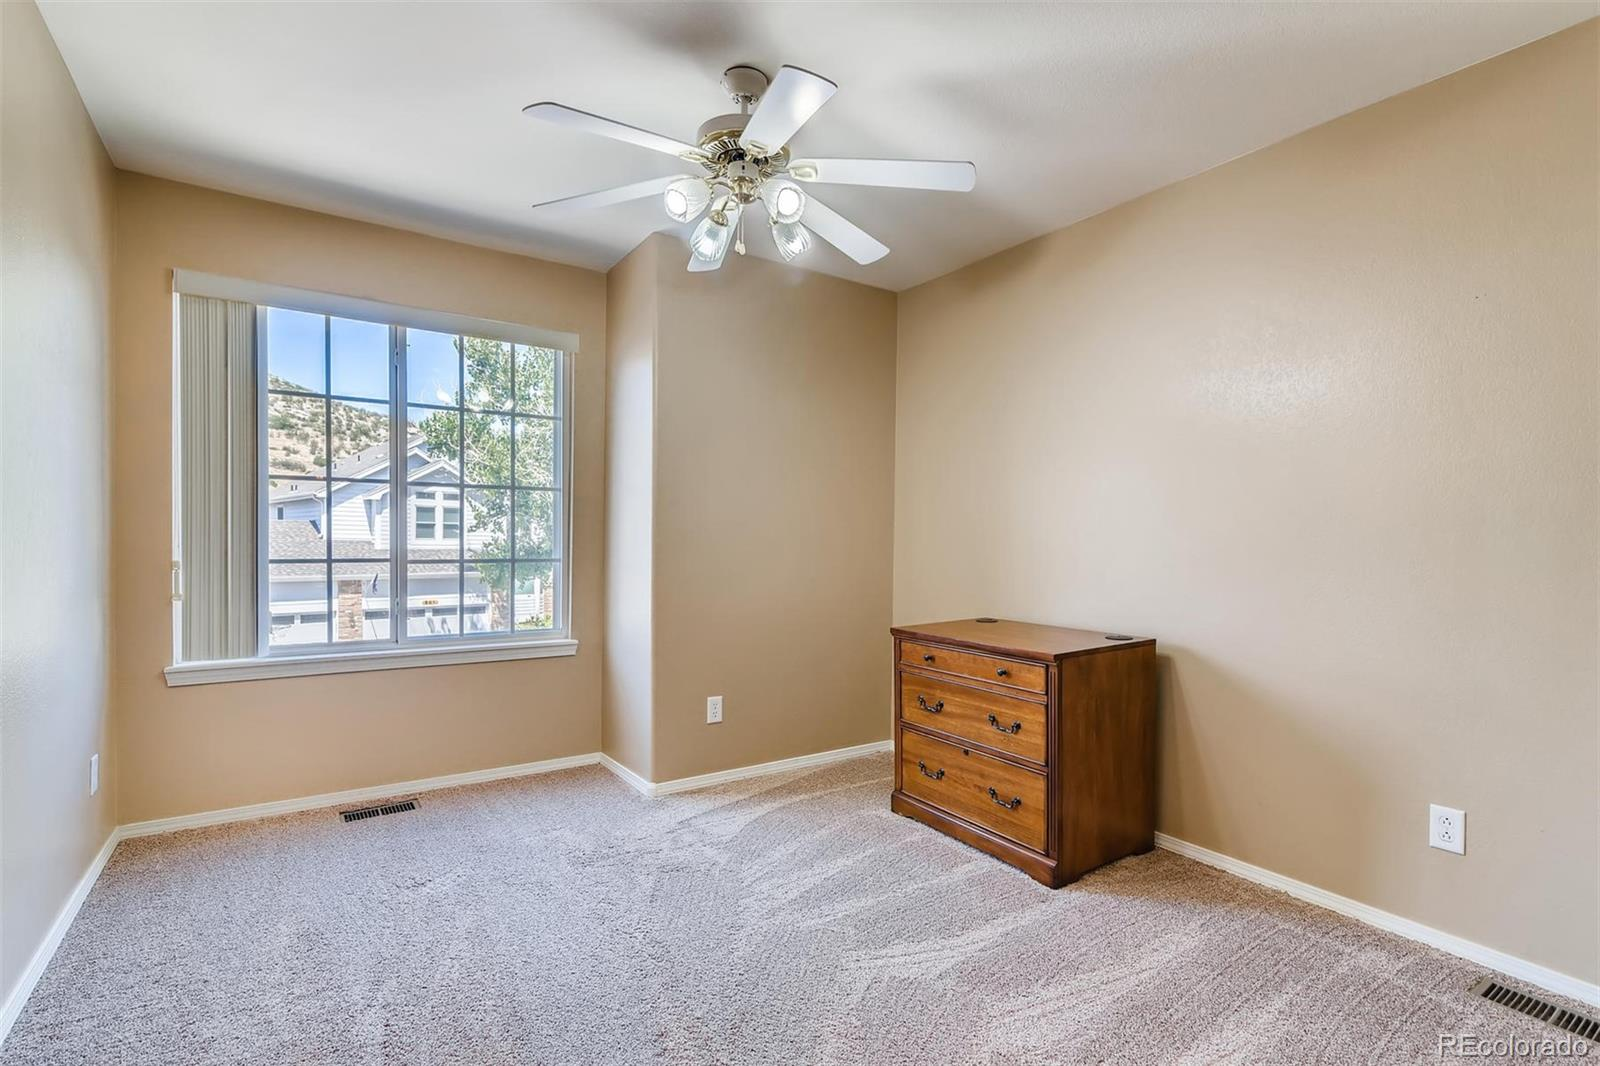 MLS# 9724731 - 26 - 498 Promontory Drive, Loveland, CO 80537